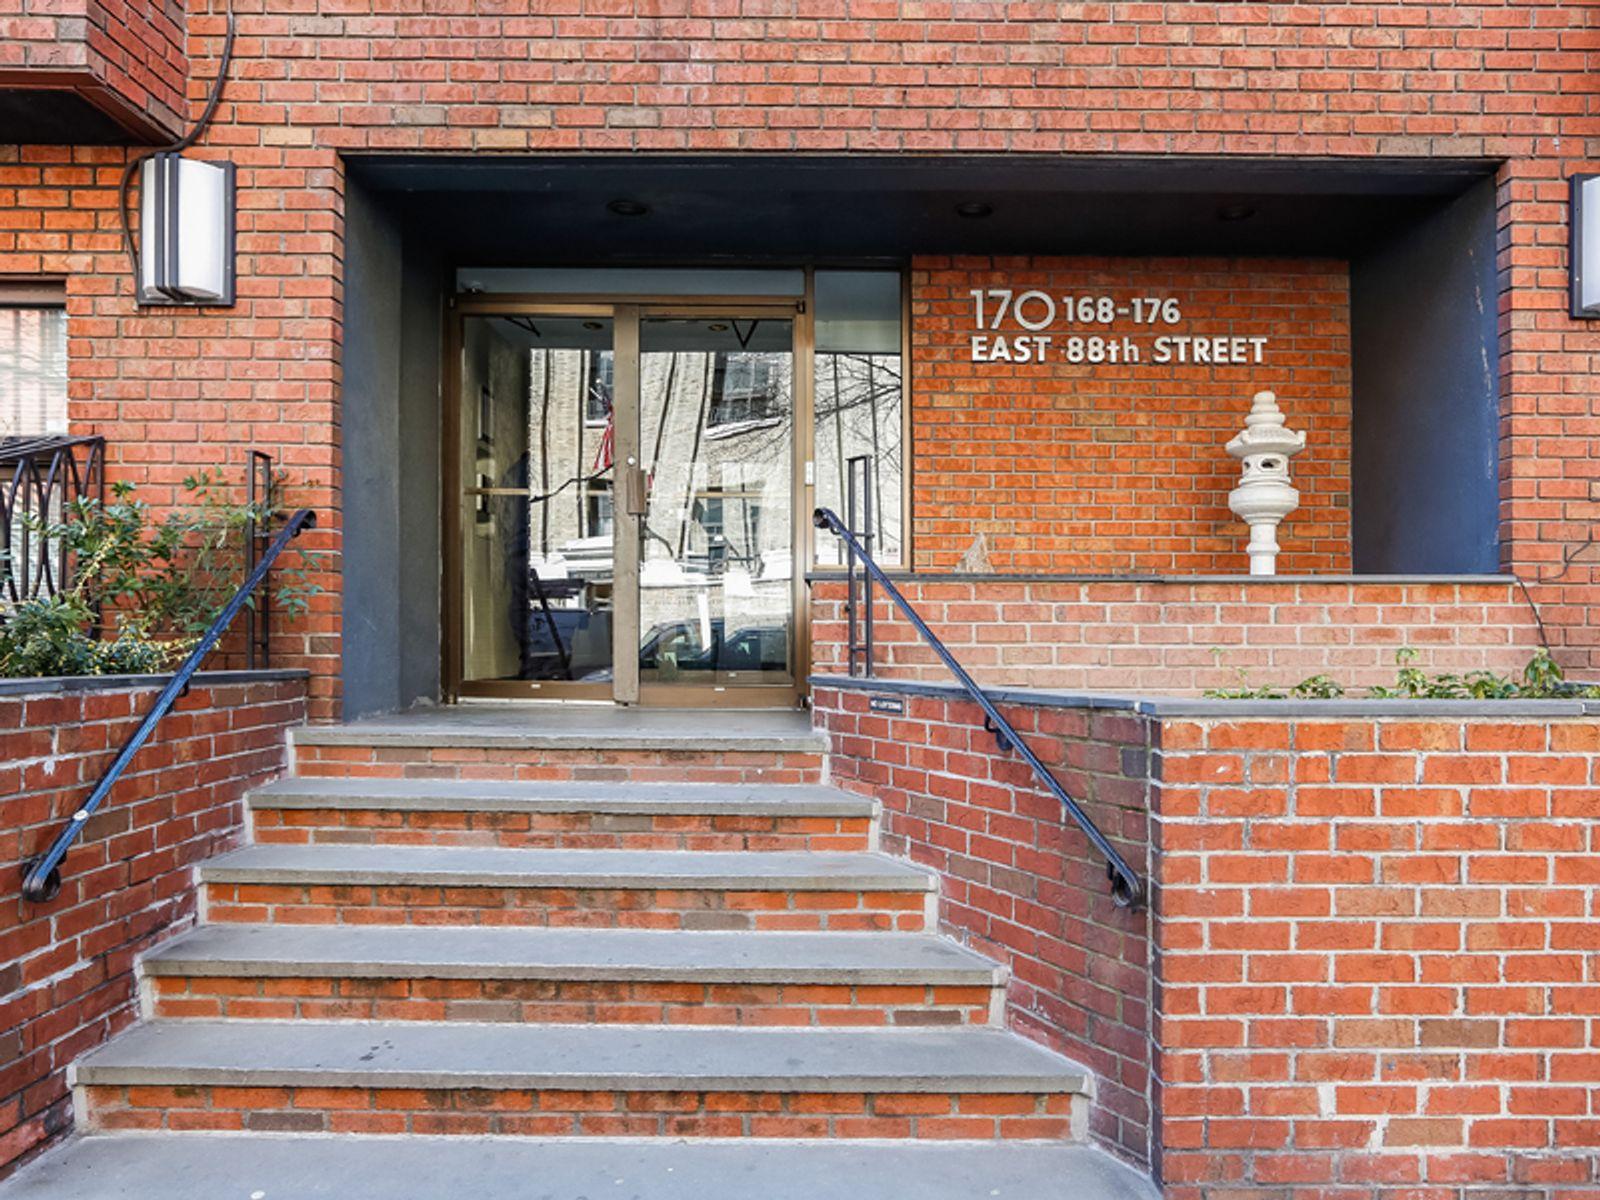 170 East 88th Street